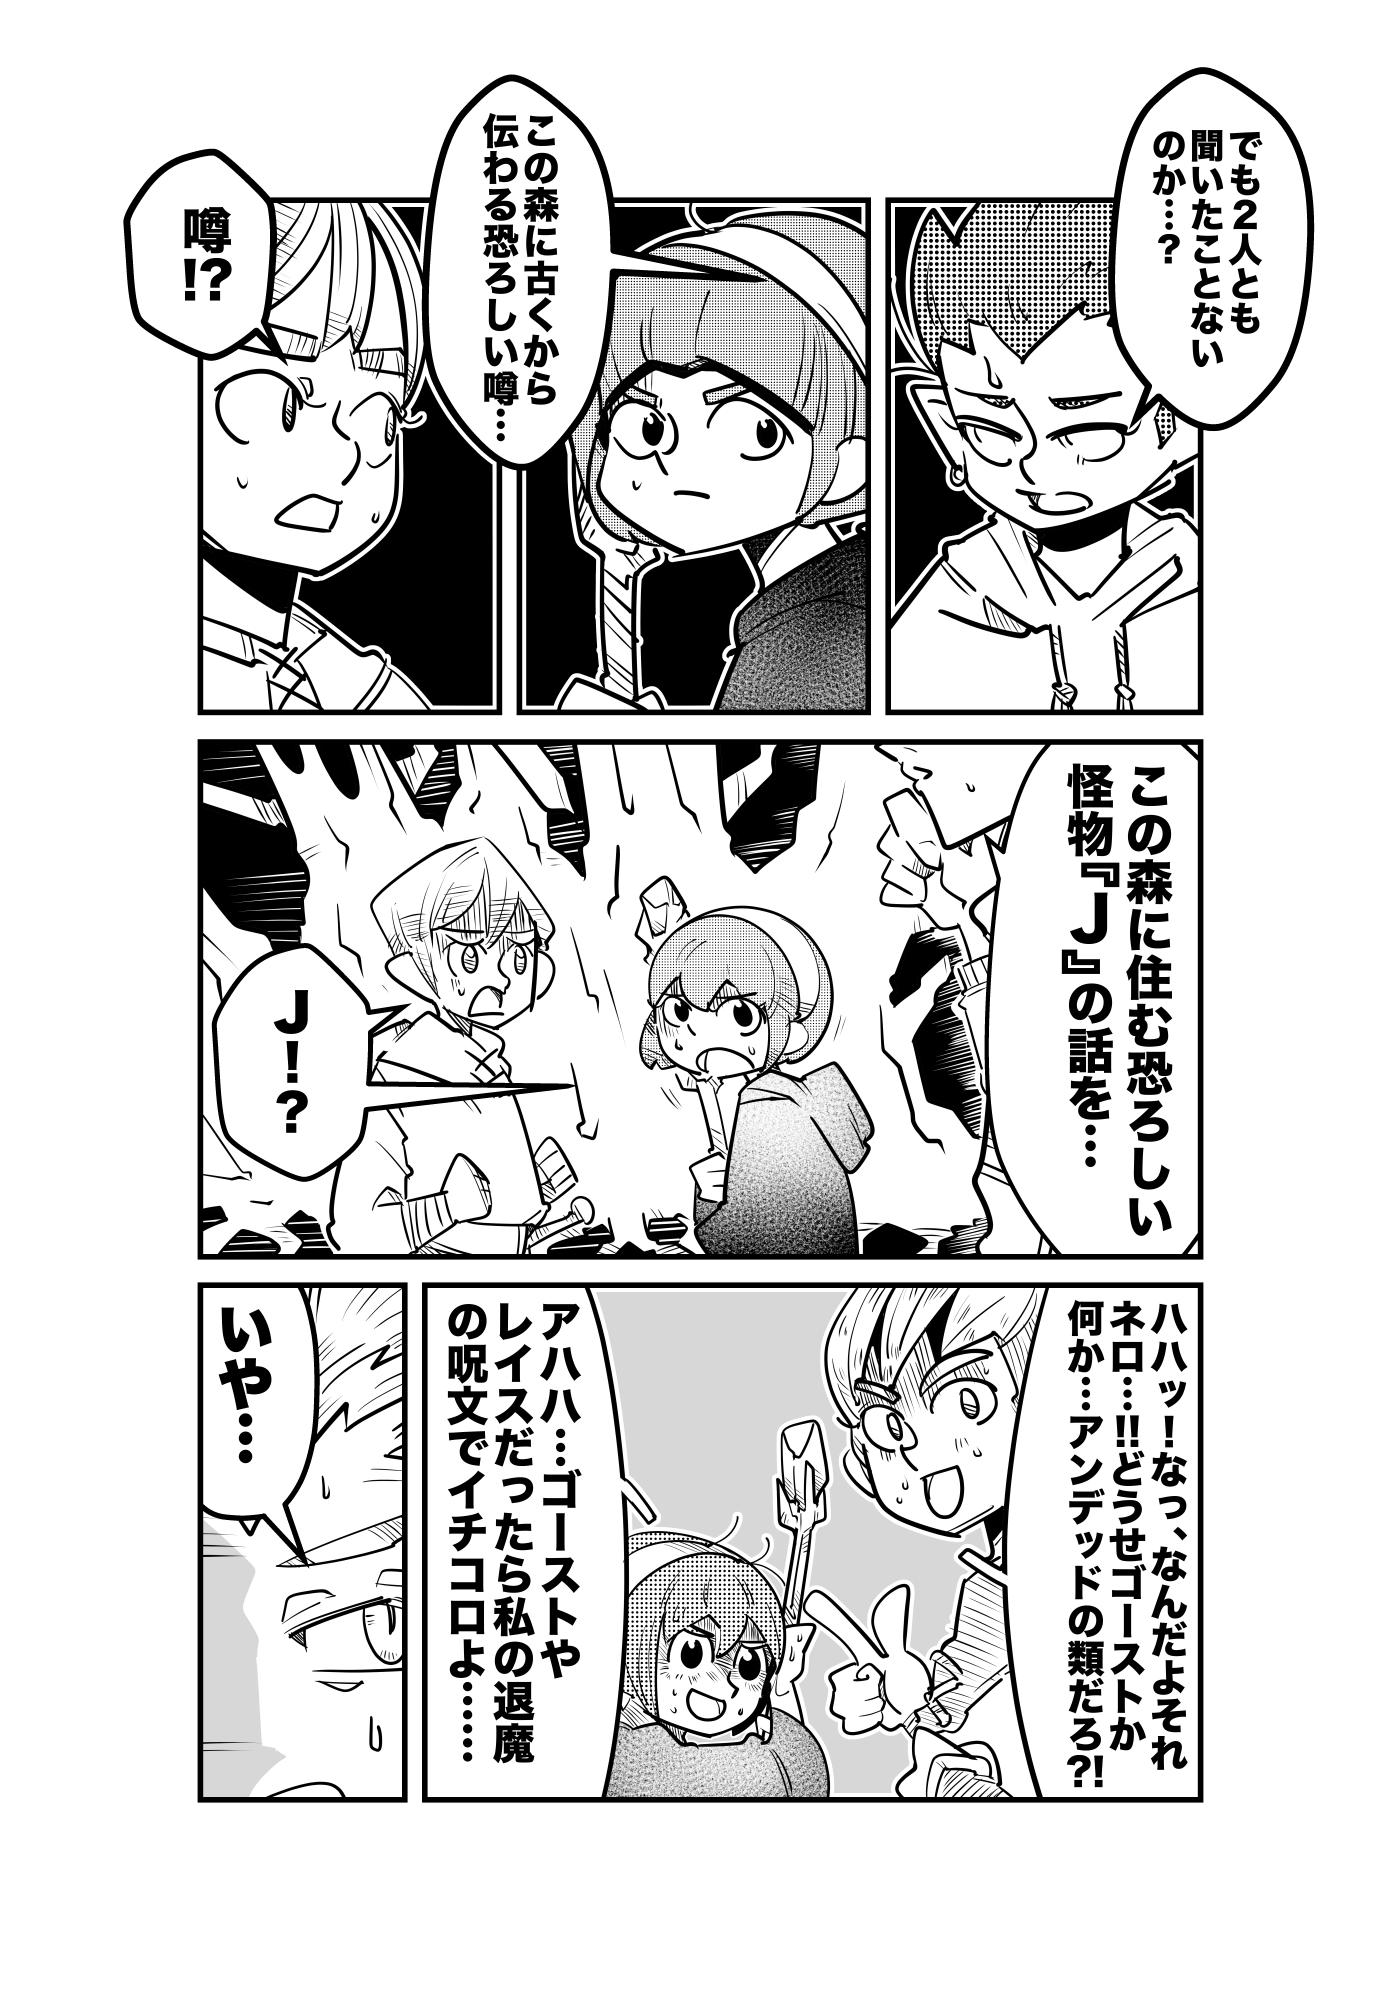 f:id:terashimaru117:20210914225705p:plain